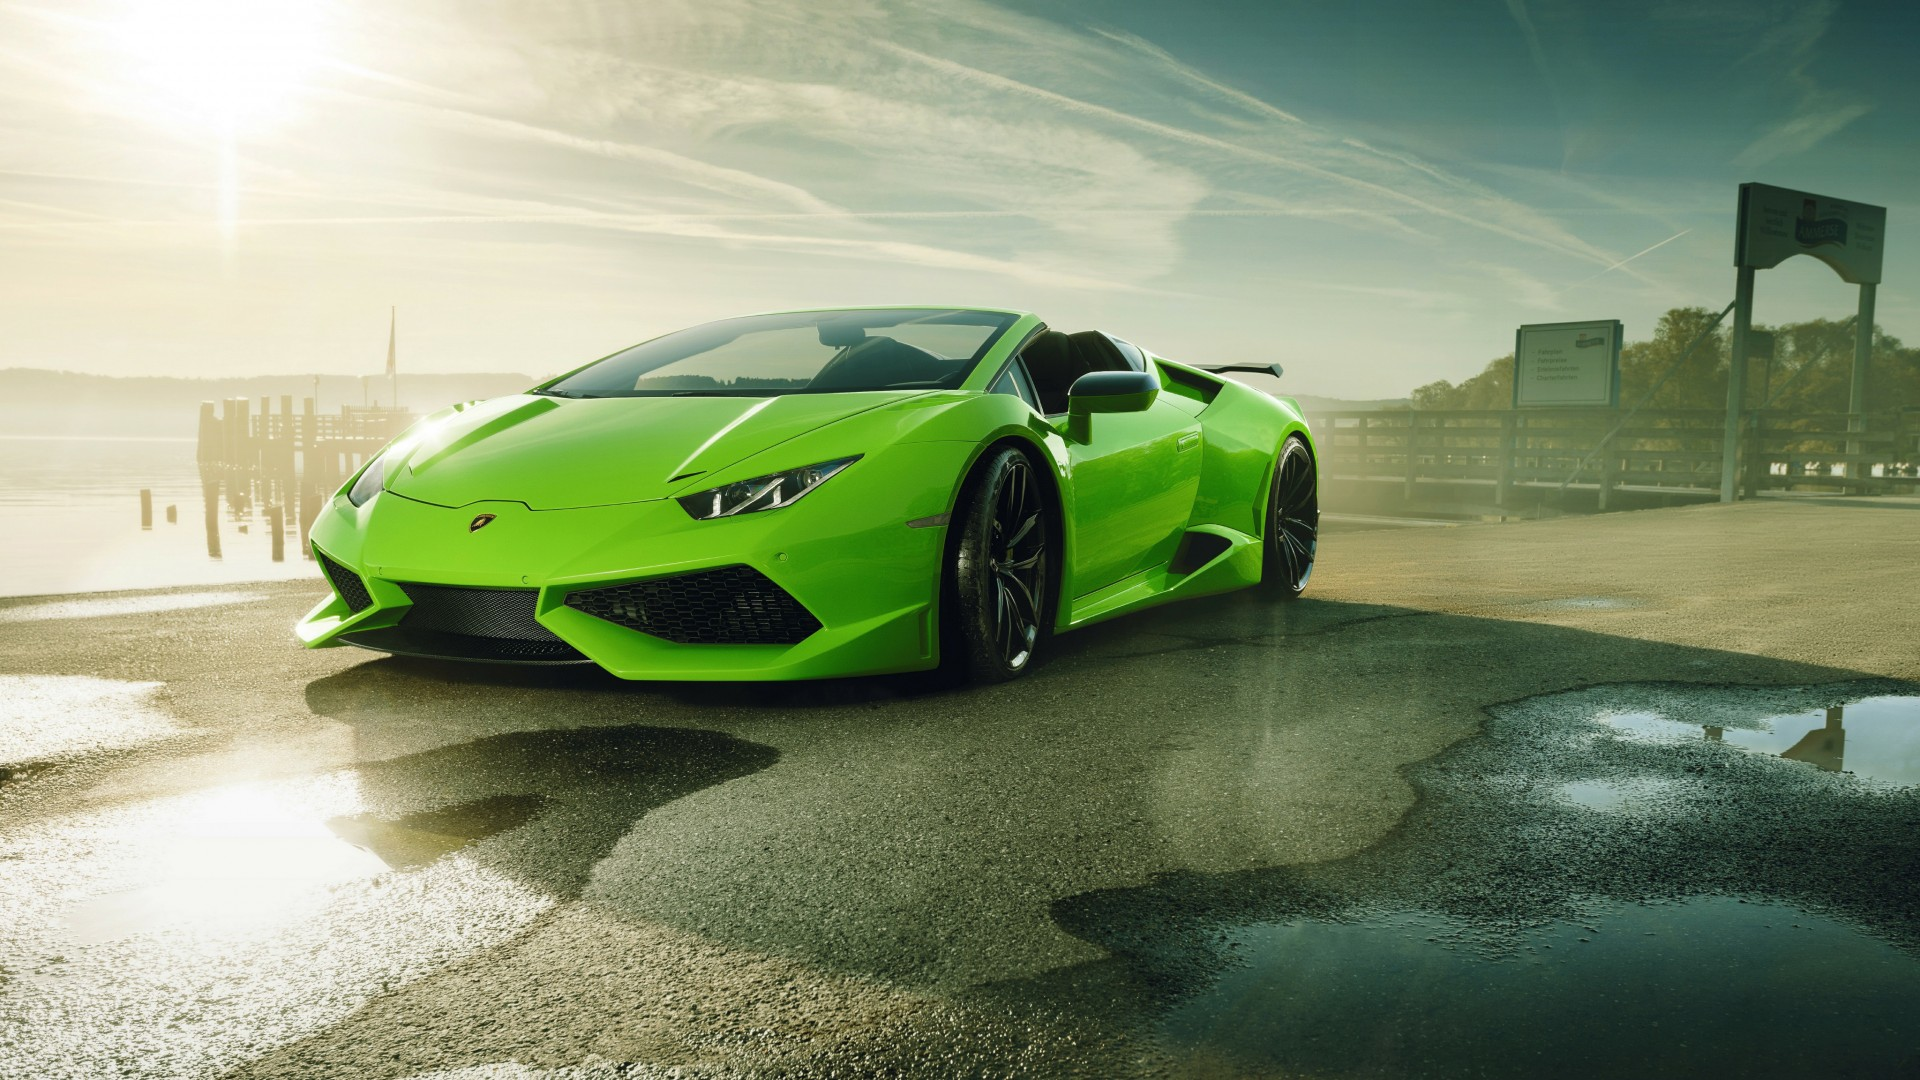 High Performance Car Pc Desktop Wallpaper Novitec N Largo Lamborghini Huracan Spyder 4k Wallpaper